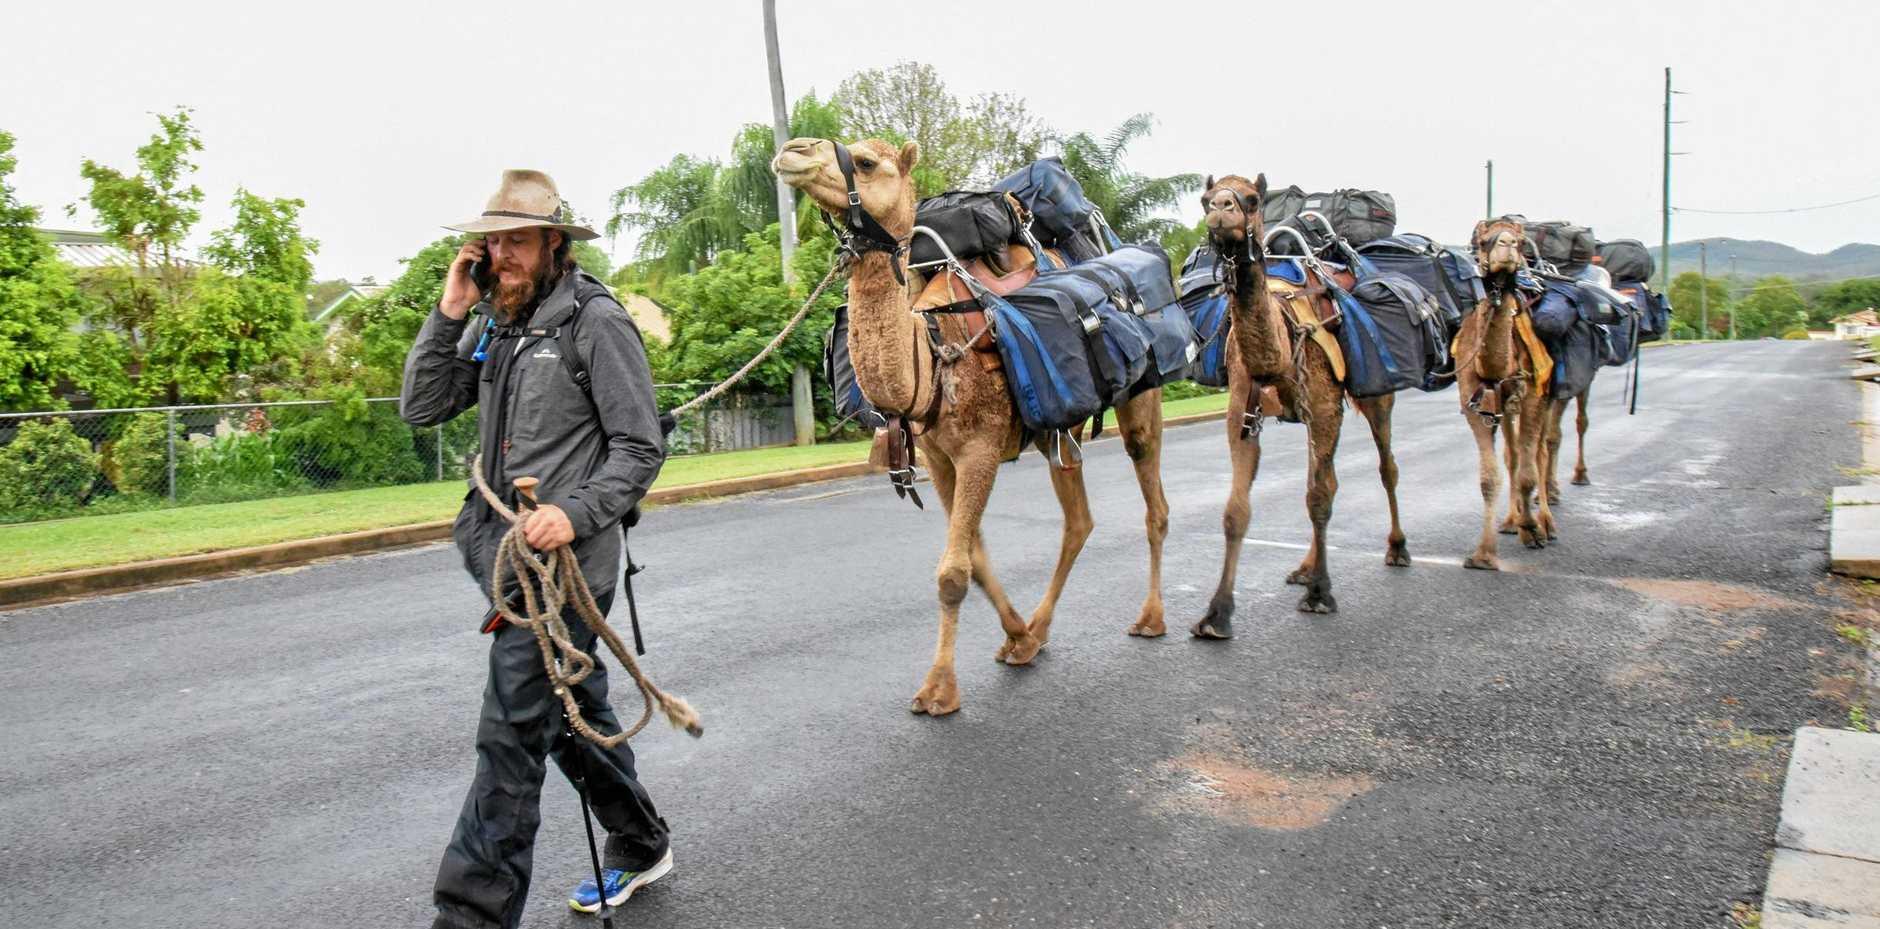 WANDERER: John Elliott with camels Ted, Jackson, Arthur and Bill, in Gayndah.